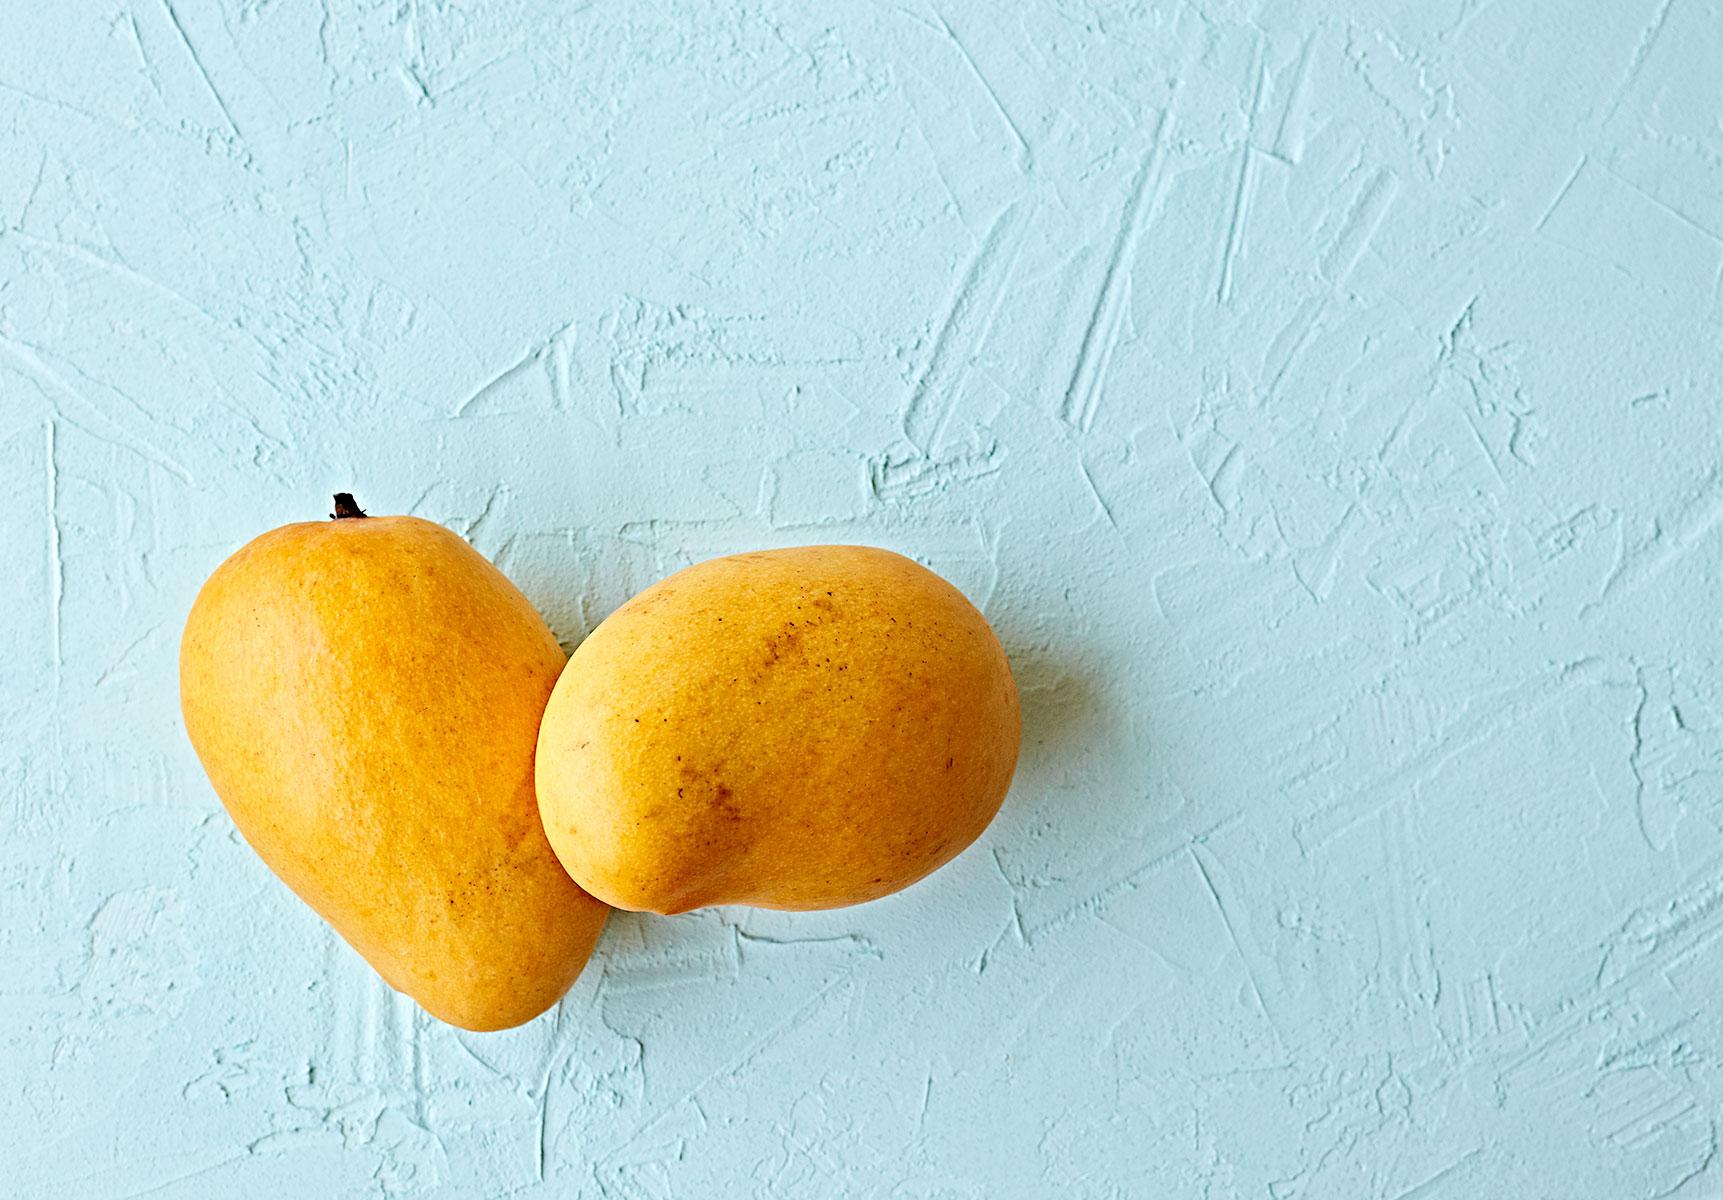 Alphonso mango on blue plaster table top.